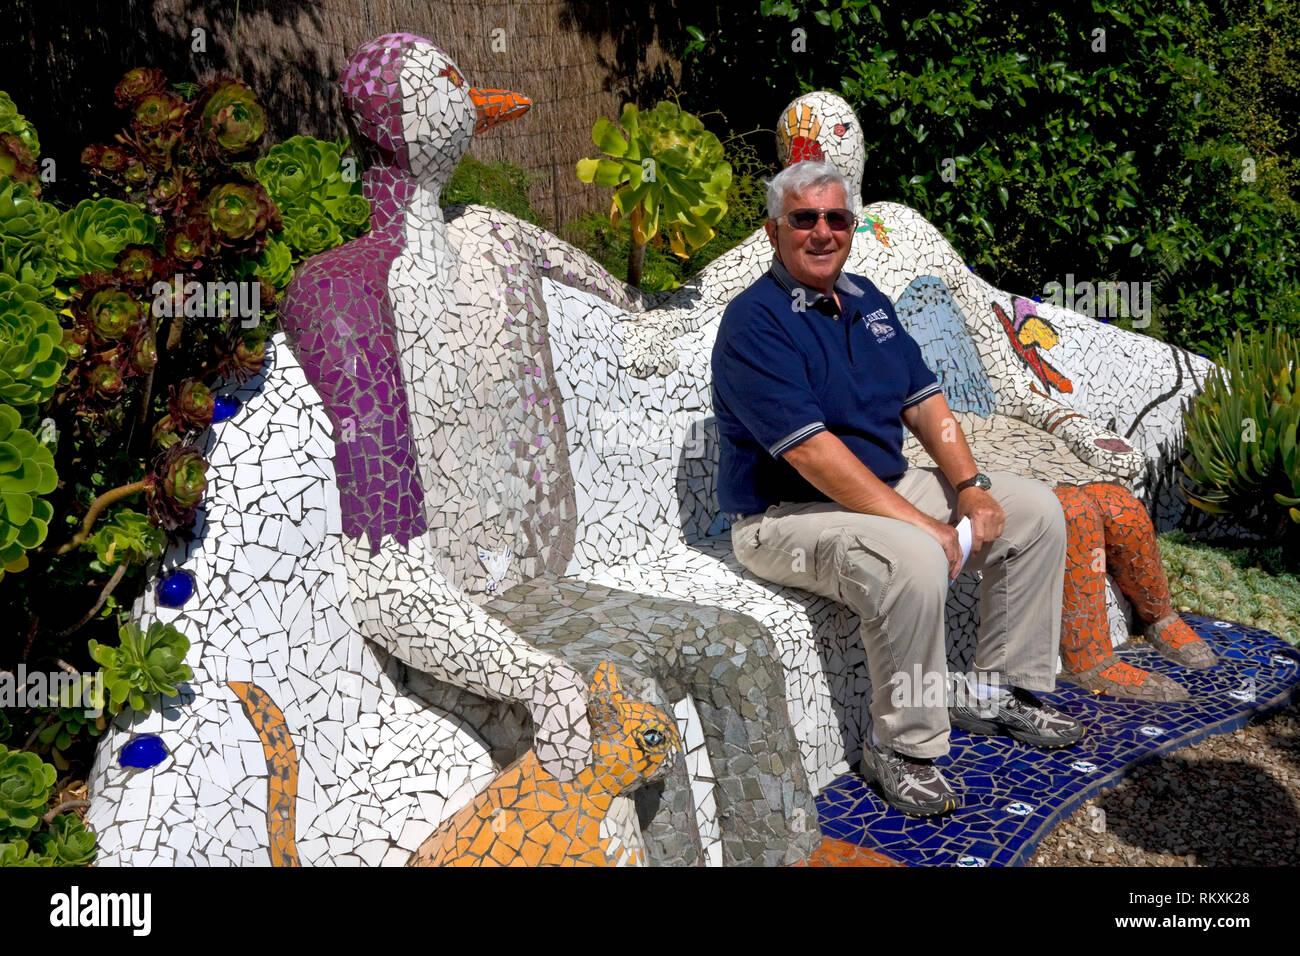 Tremendous Mosaic Bench Figures Cat Art Man Sitting Garden Scene Ibusinesslaw Wood Chair Design Ideas Ibusinesslaworg